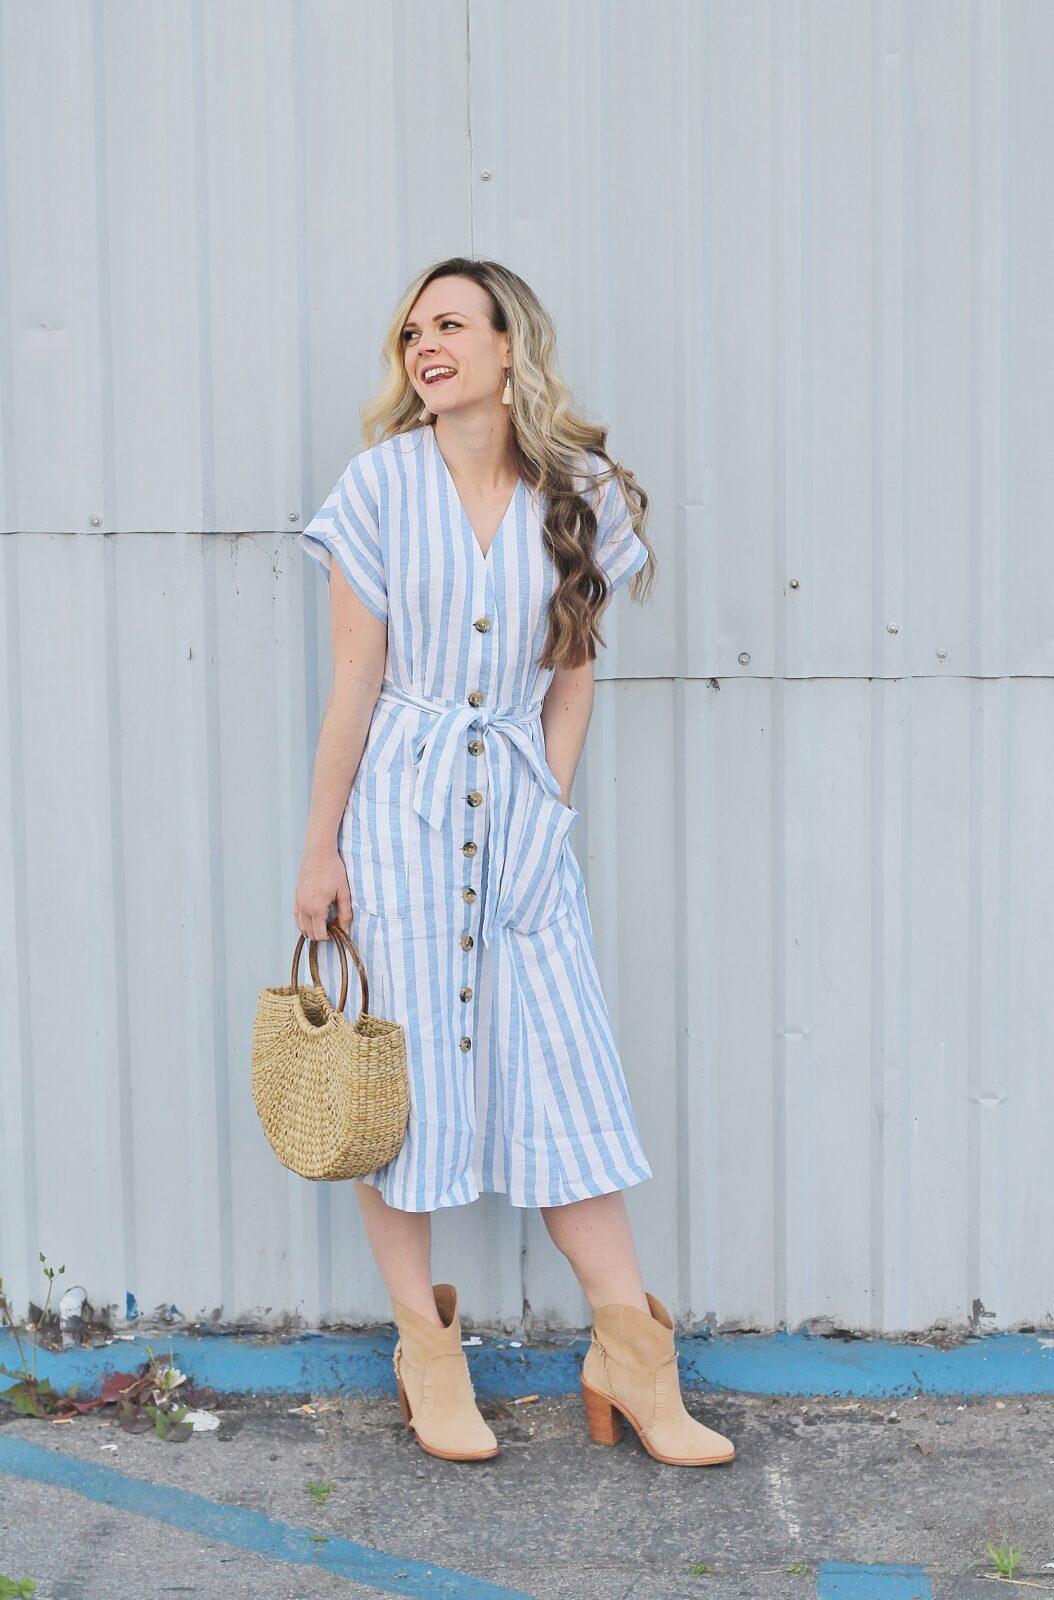 bfd244aec079 the perfect striped midi dress